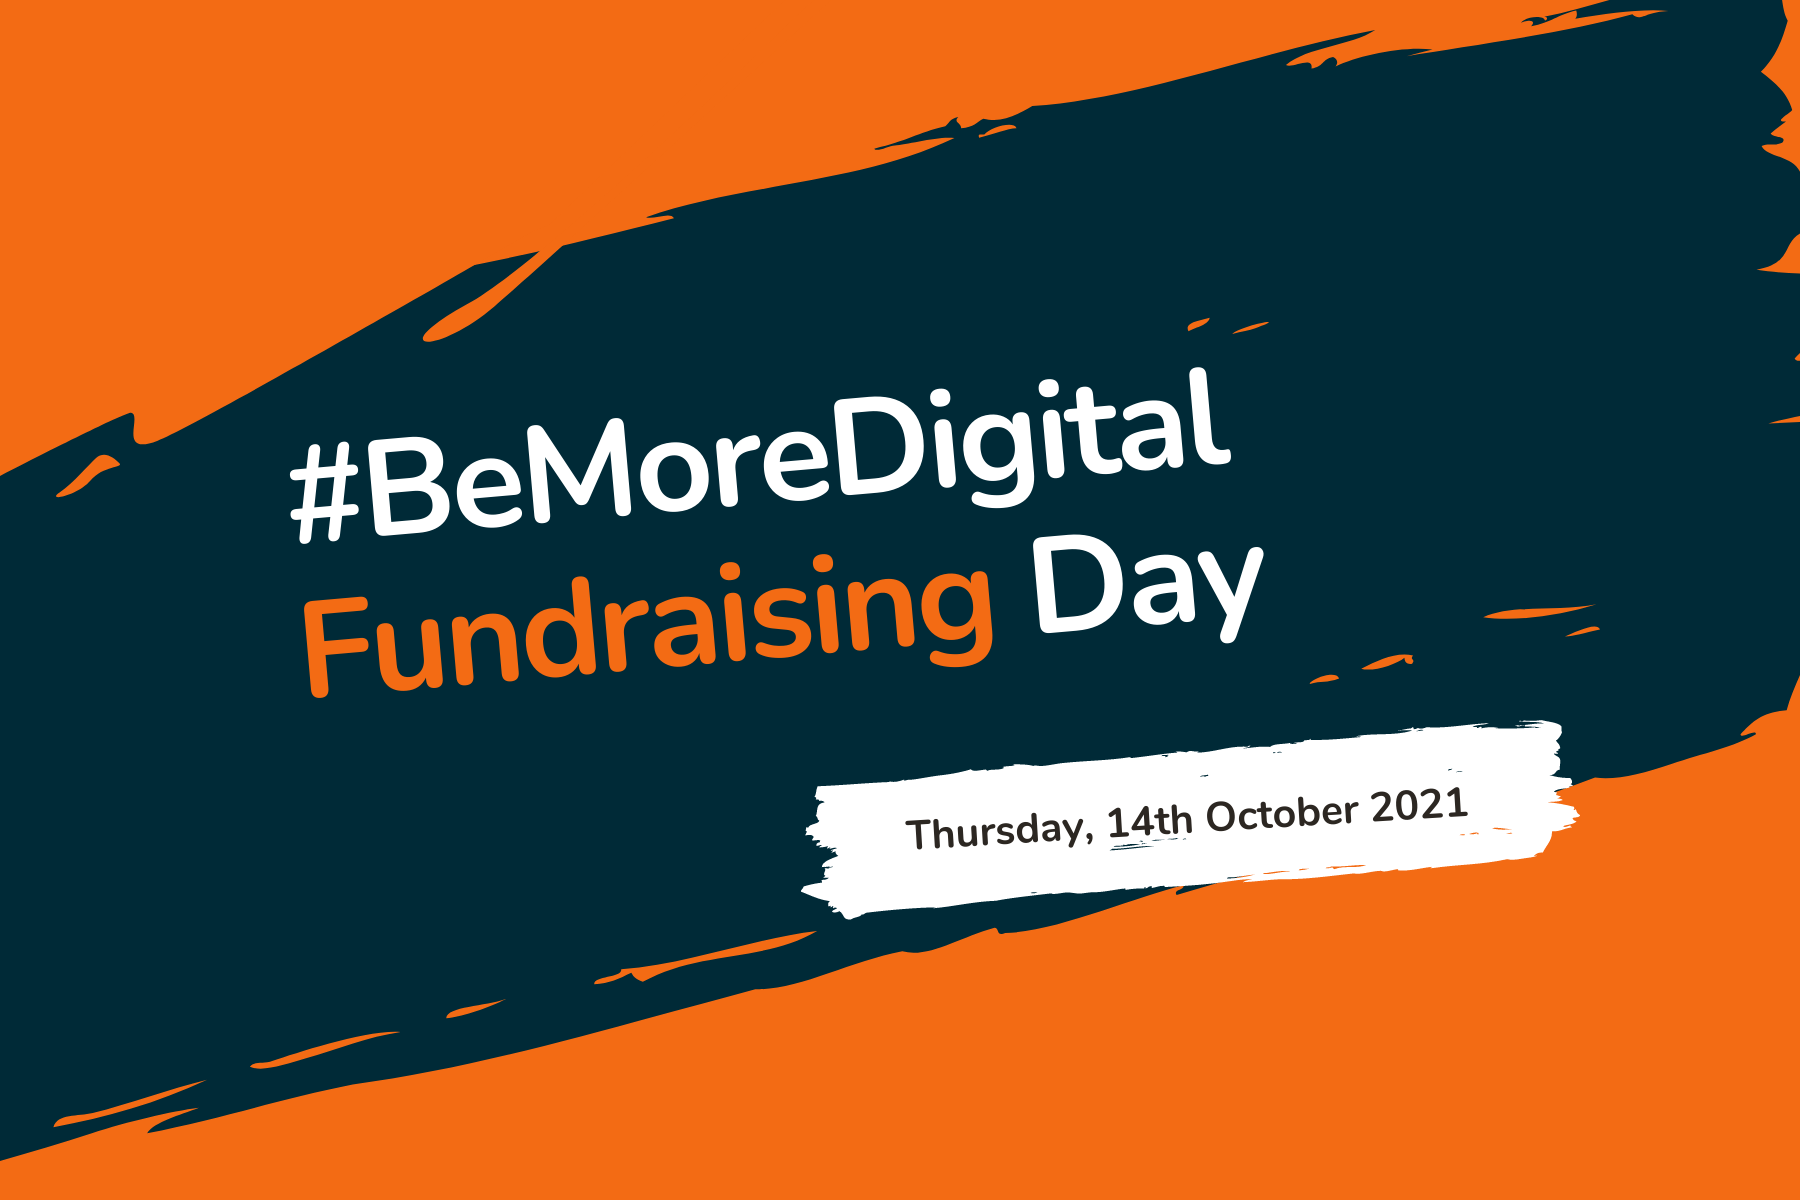 #BeMoreDigital Fundraising Day 2021